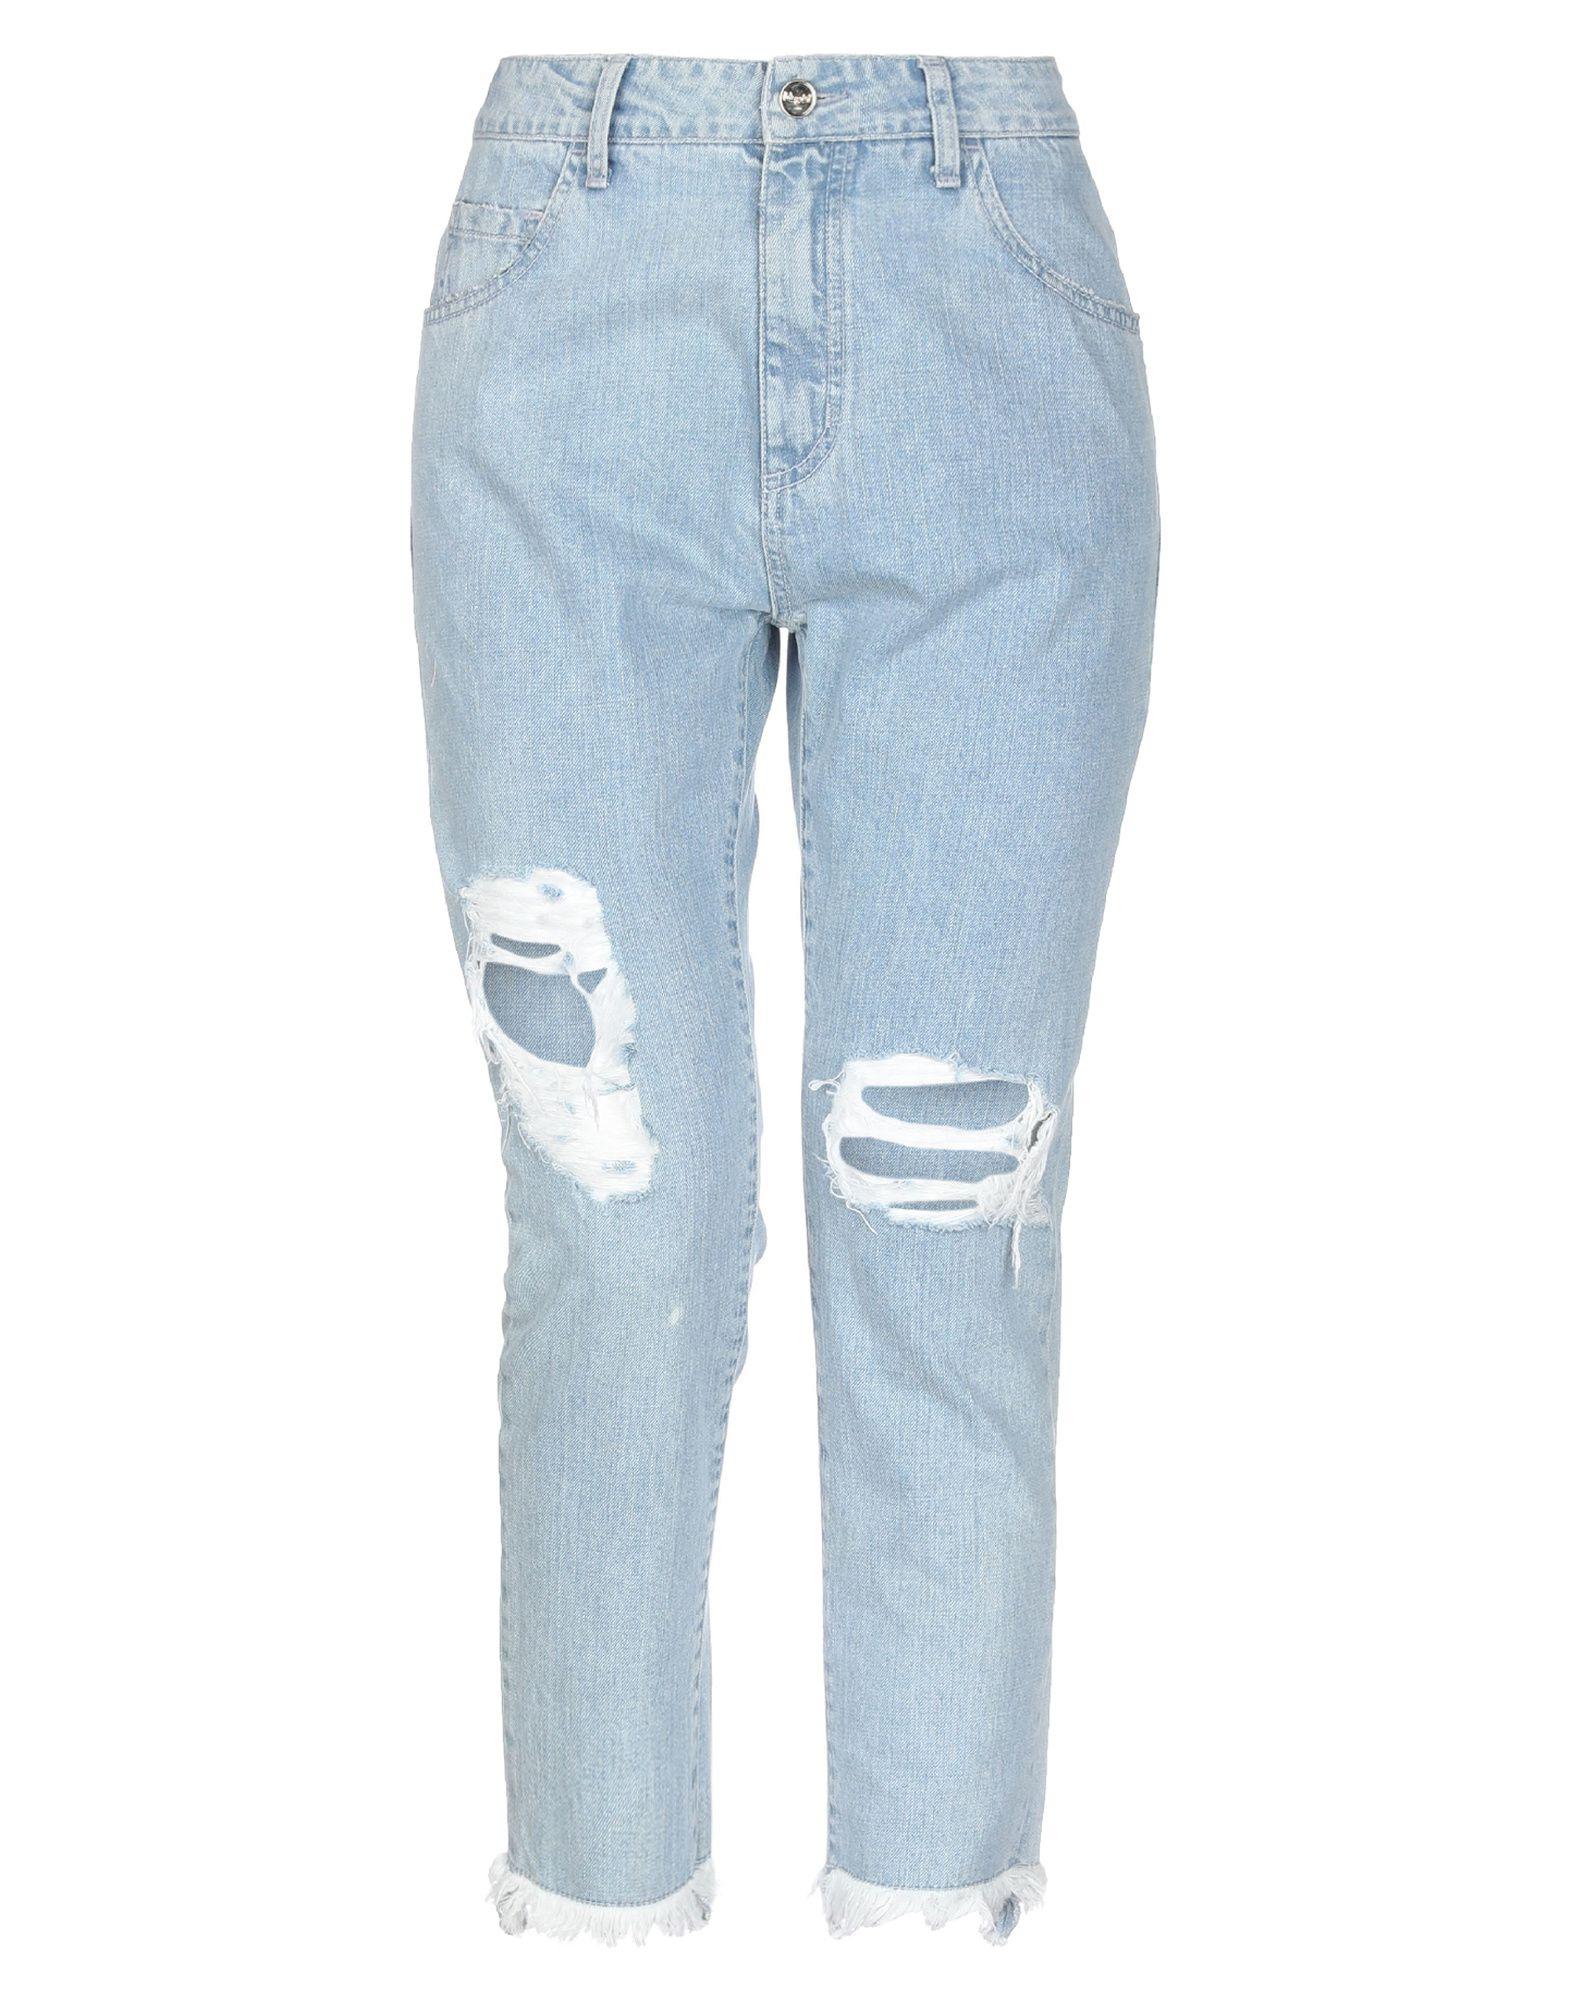 BLUGIRL JEANS Джинсовые брюки summer boyfriend jeans for women hole ripped white lace flowers denim pants low waist mujer vintage skinny stretch jeans female